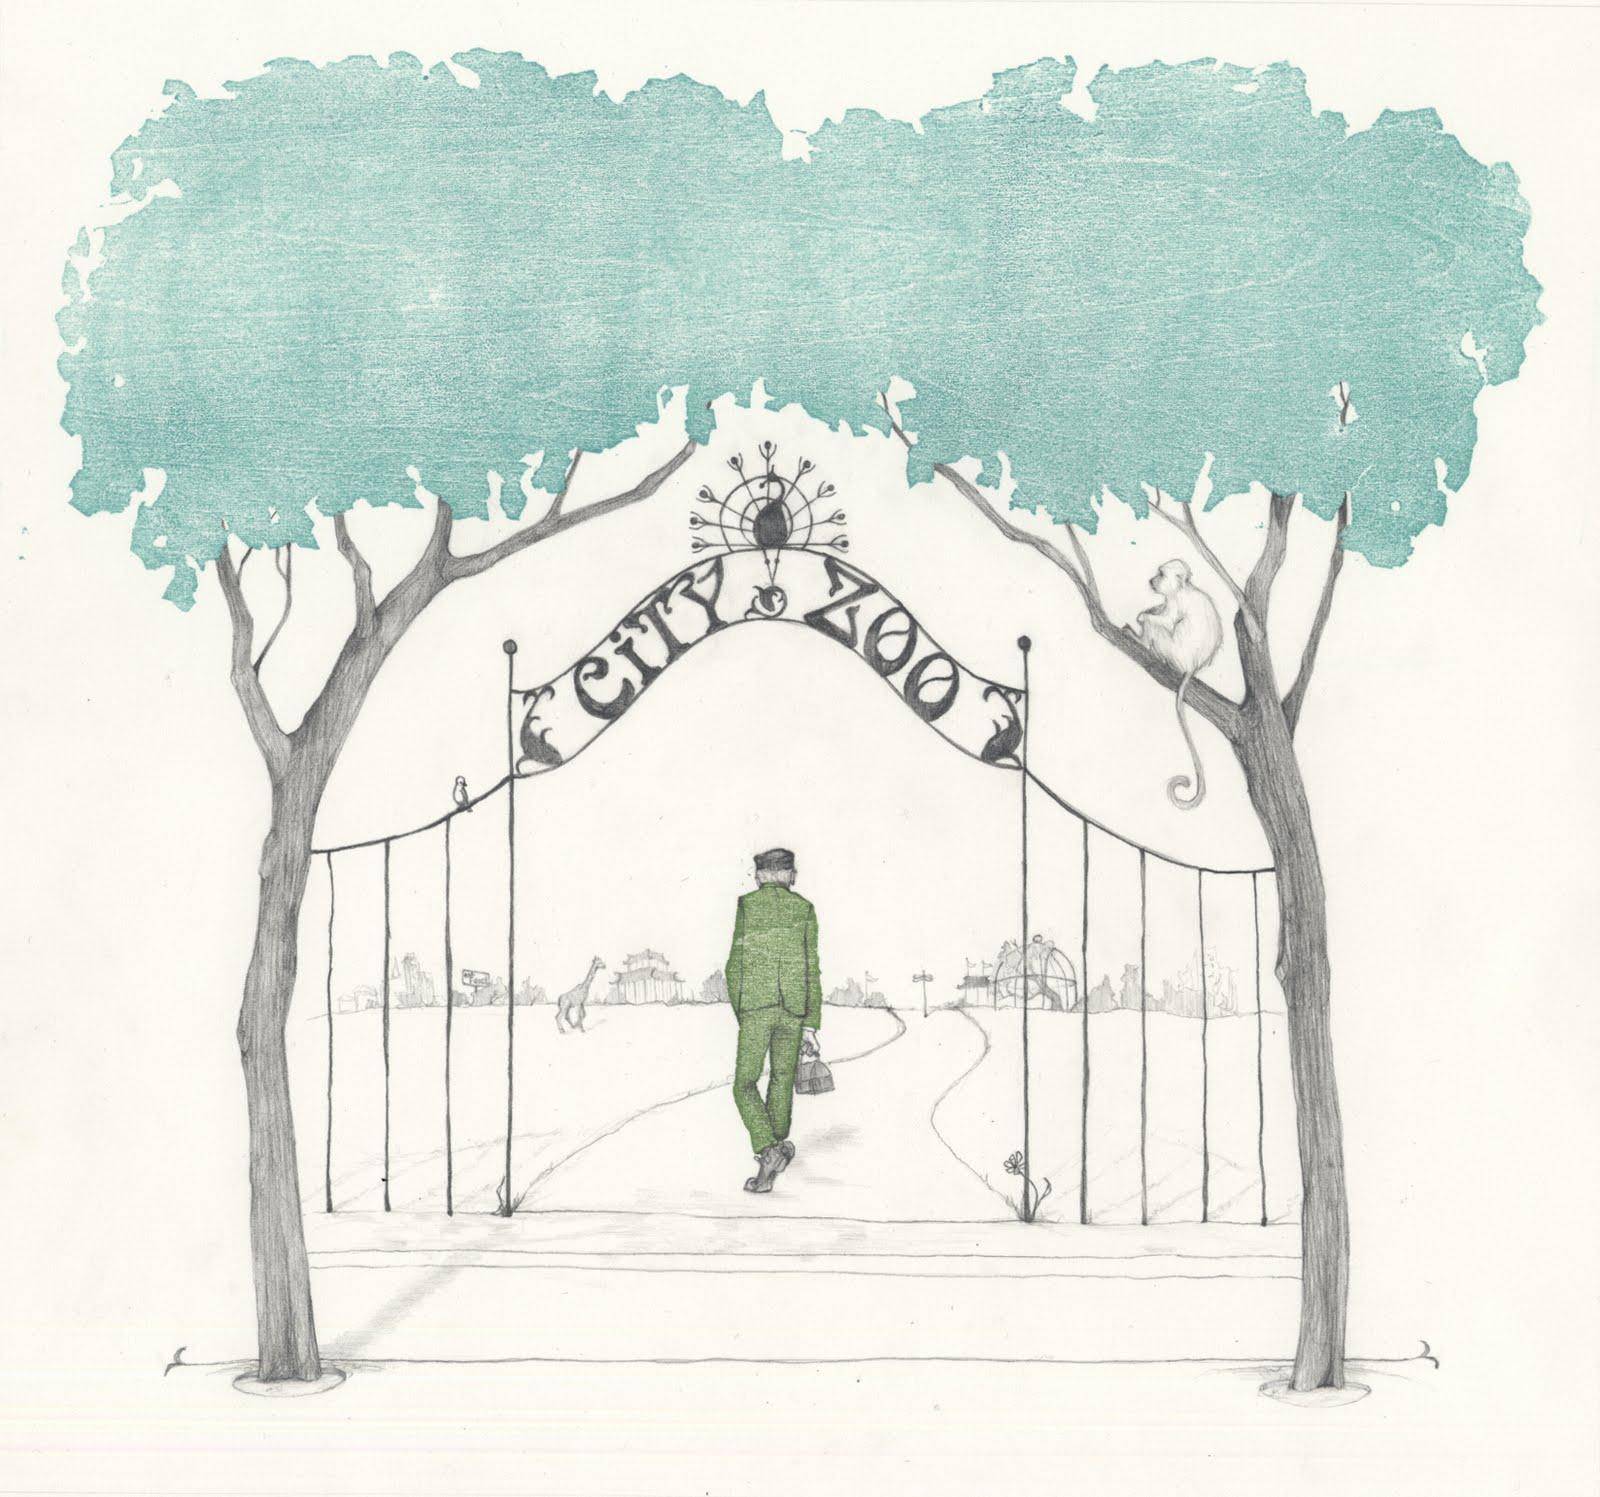 sc whiddon art illustrator erin e stead A Sick Day for Amos McGee Summary  A Sick Day For Amos Mcgee Coloring Sheets